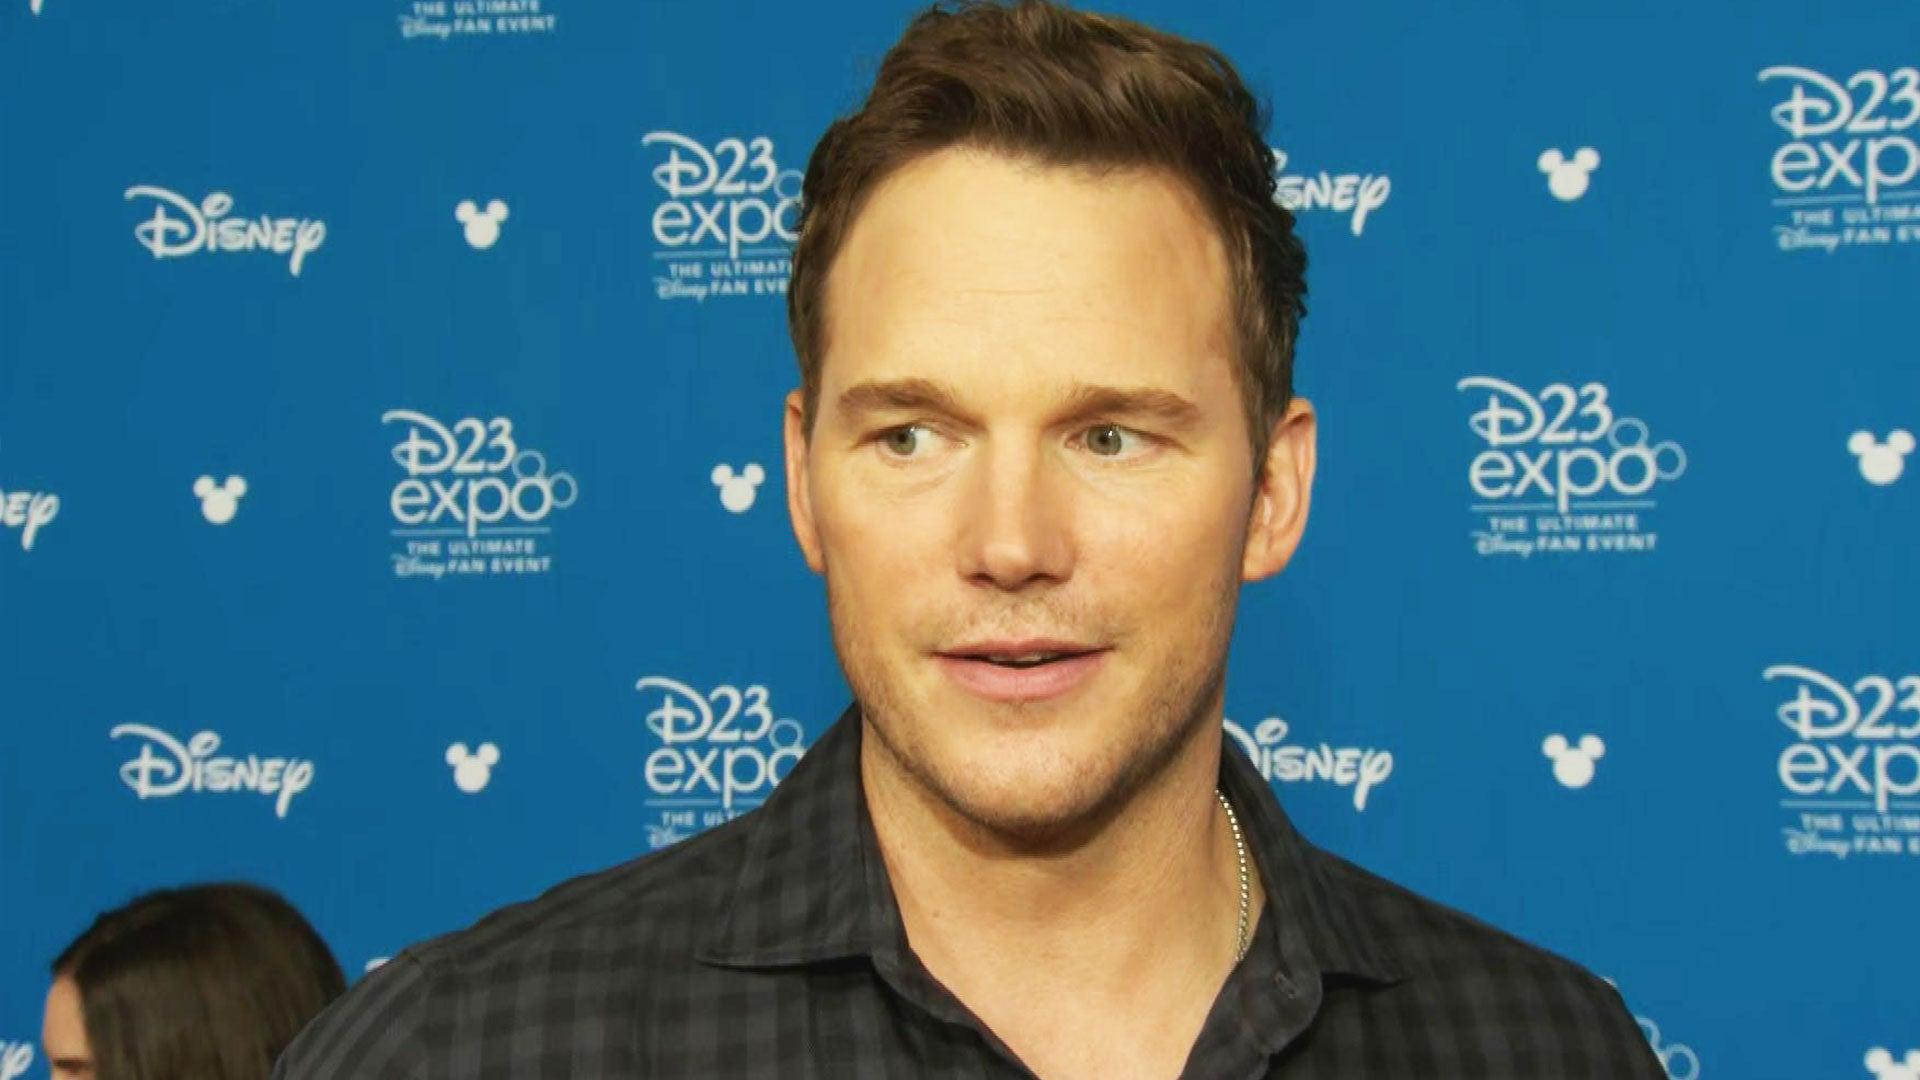 Chris Pratt Says He's 'Lucky' to Be Married to Katherine Schwarzenegger (Exclusive)